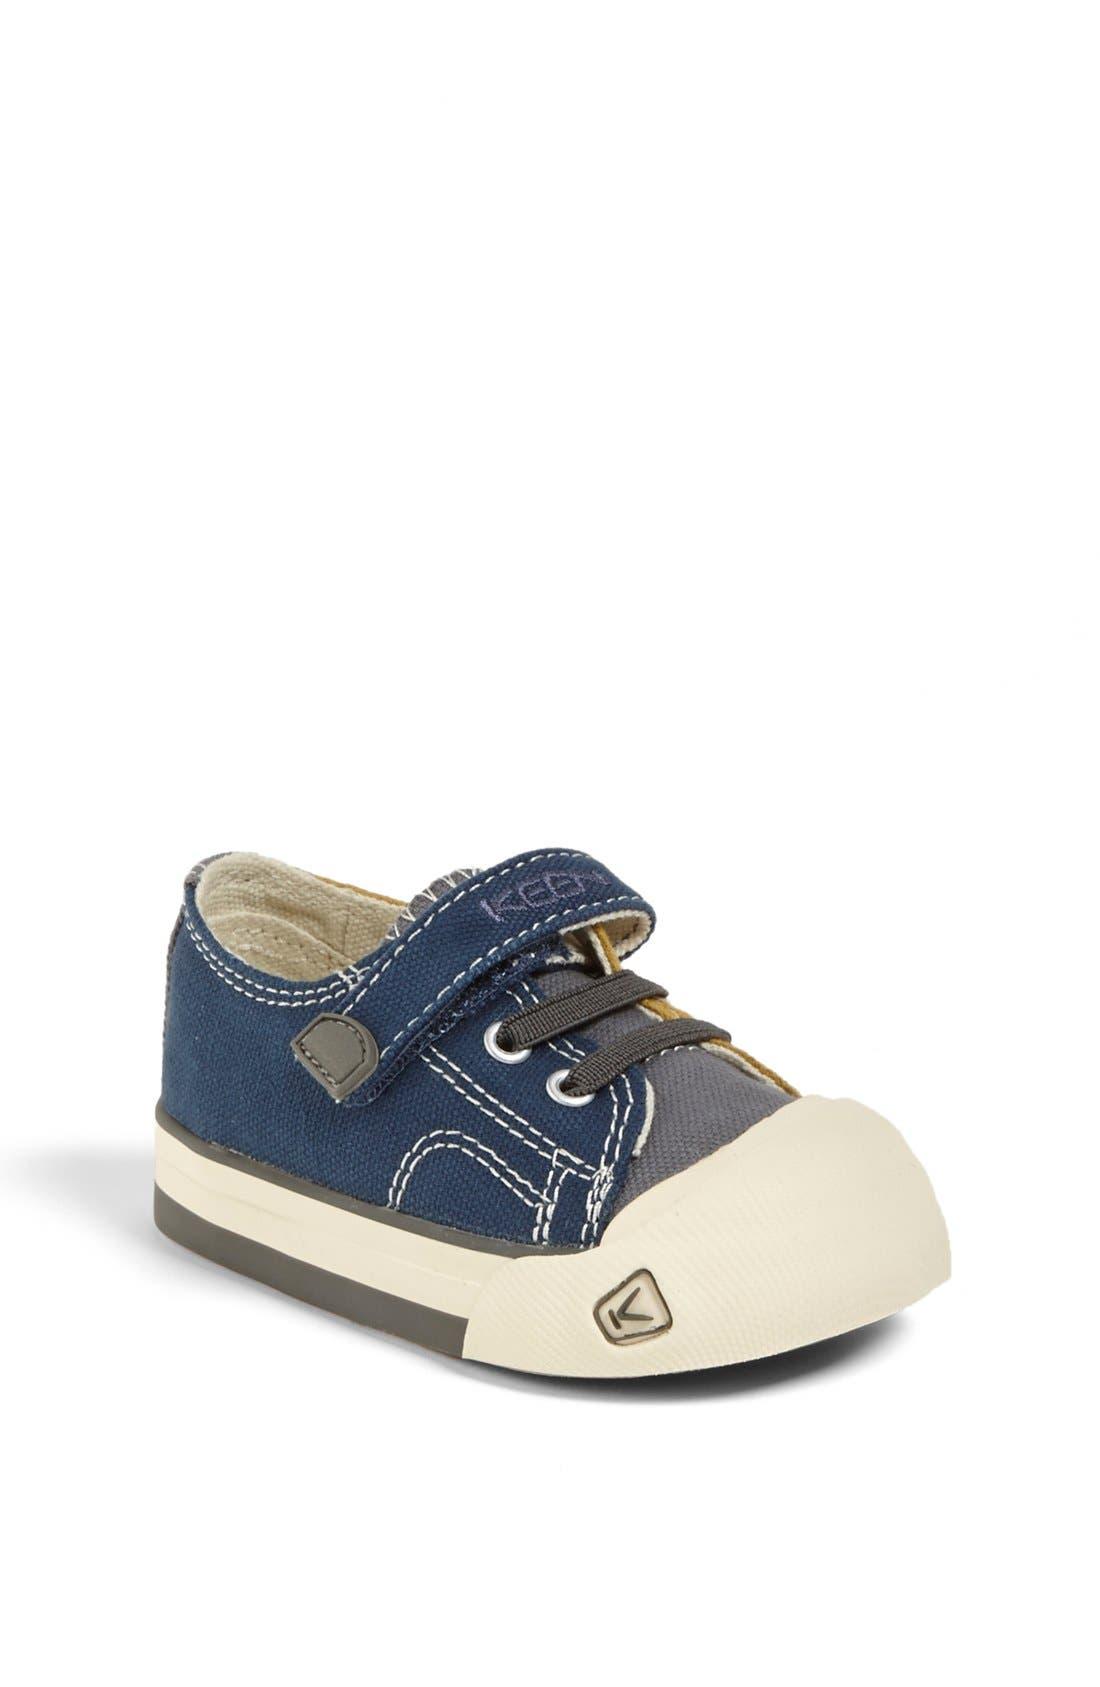 Main Image - Keen 'Coronado' Sneaker (Baby & Walker)